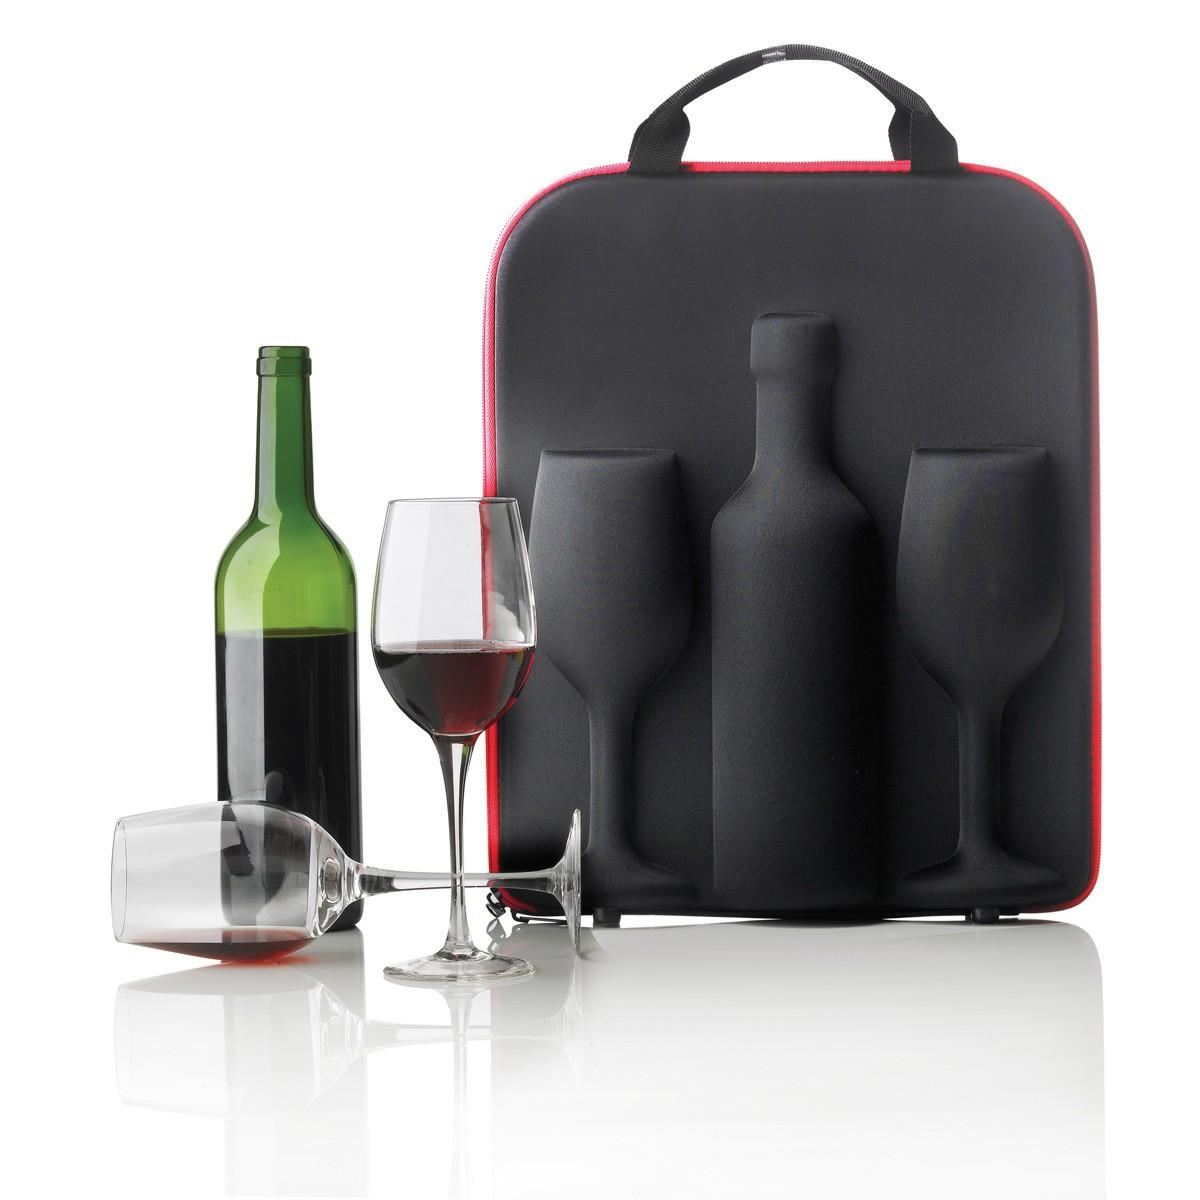 Set portabicchieri e bottiglia di vino